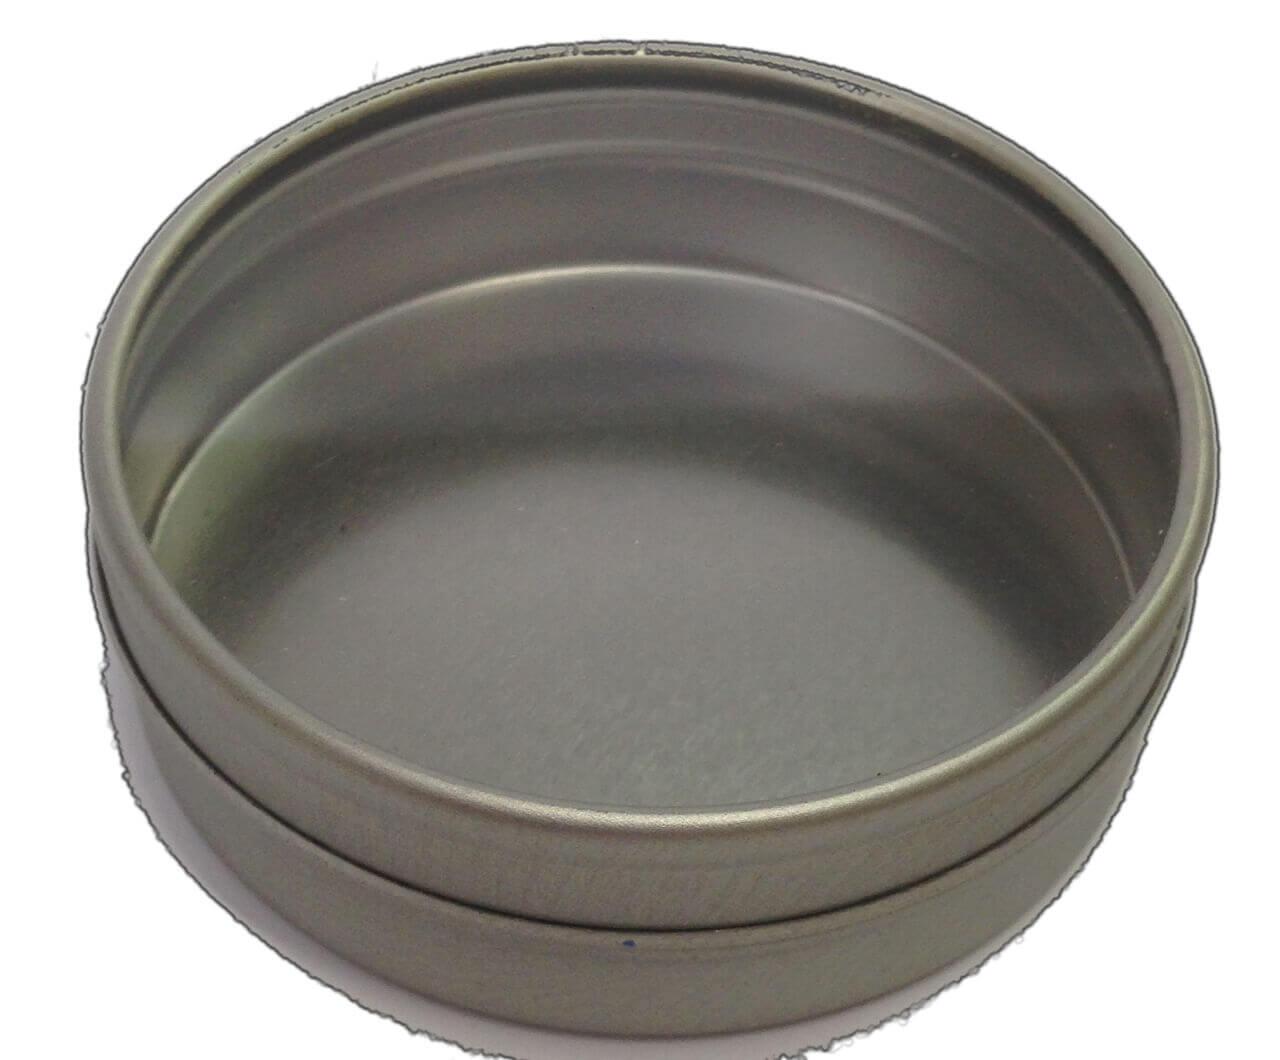 Metalldose für RohkaffeeMusterSet